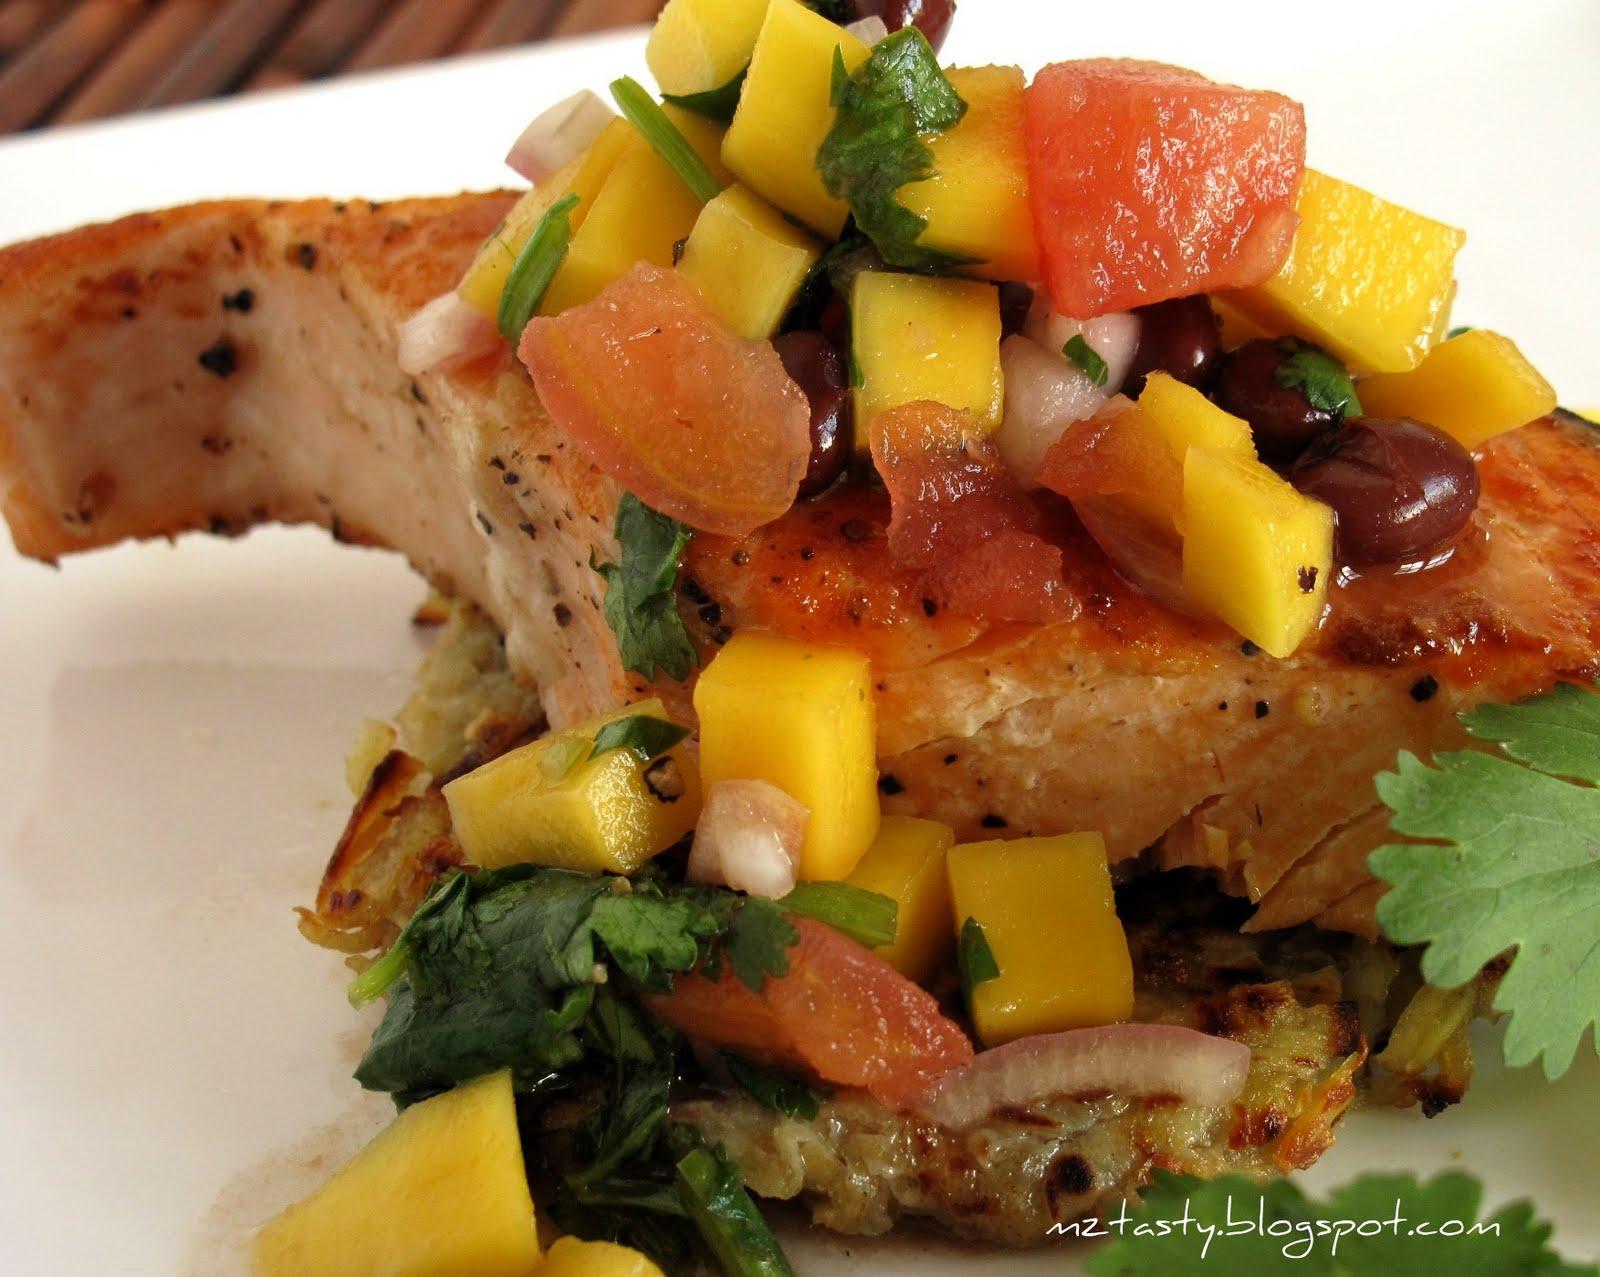 MzTasty's Kitchen, Savor The Flavor: Grilled Salmon with Mango Salsa